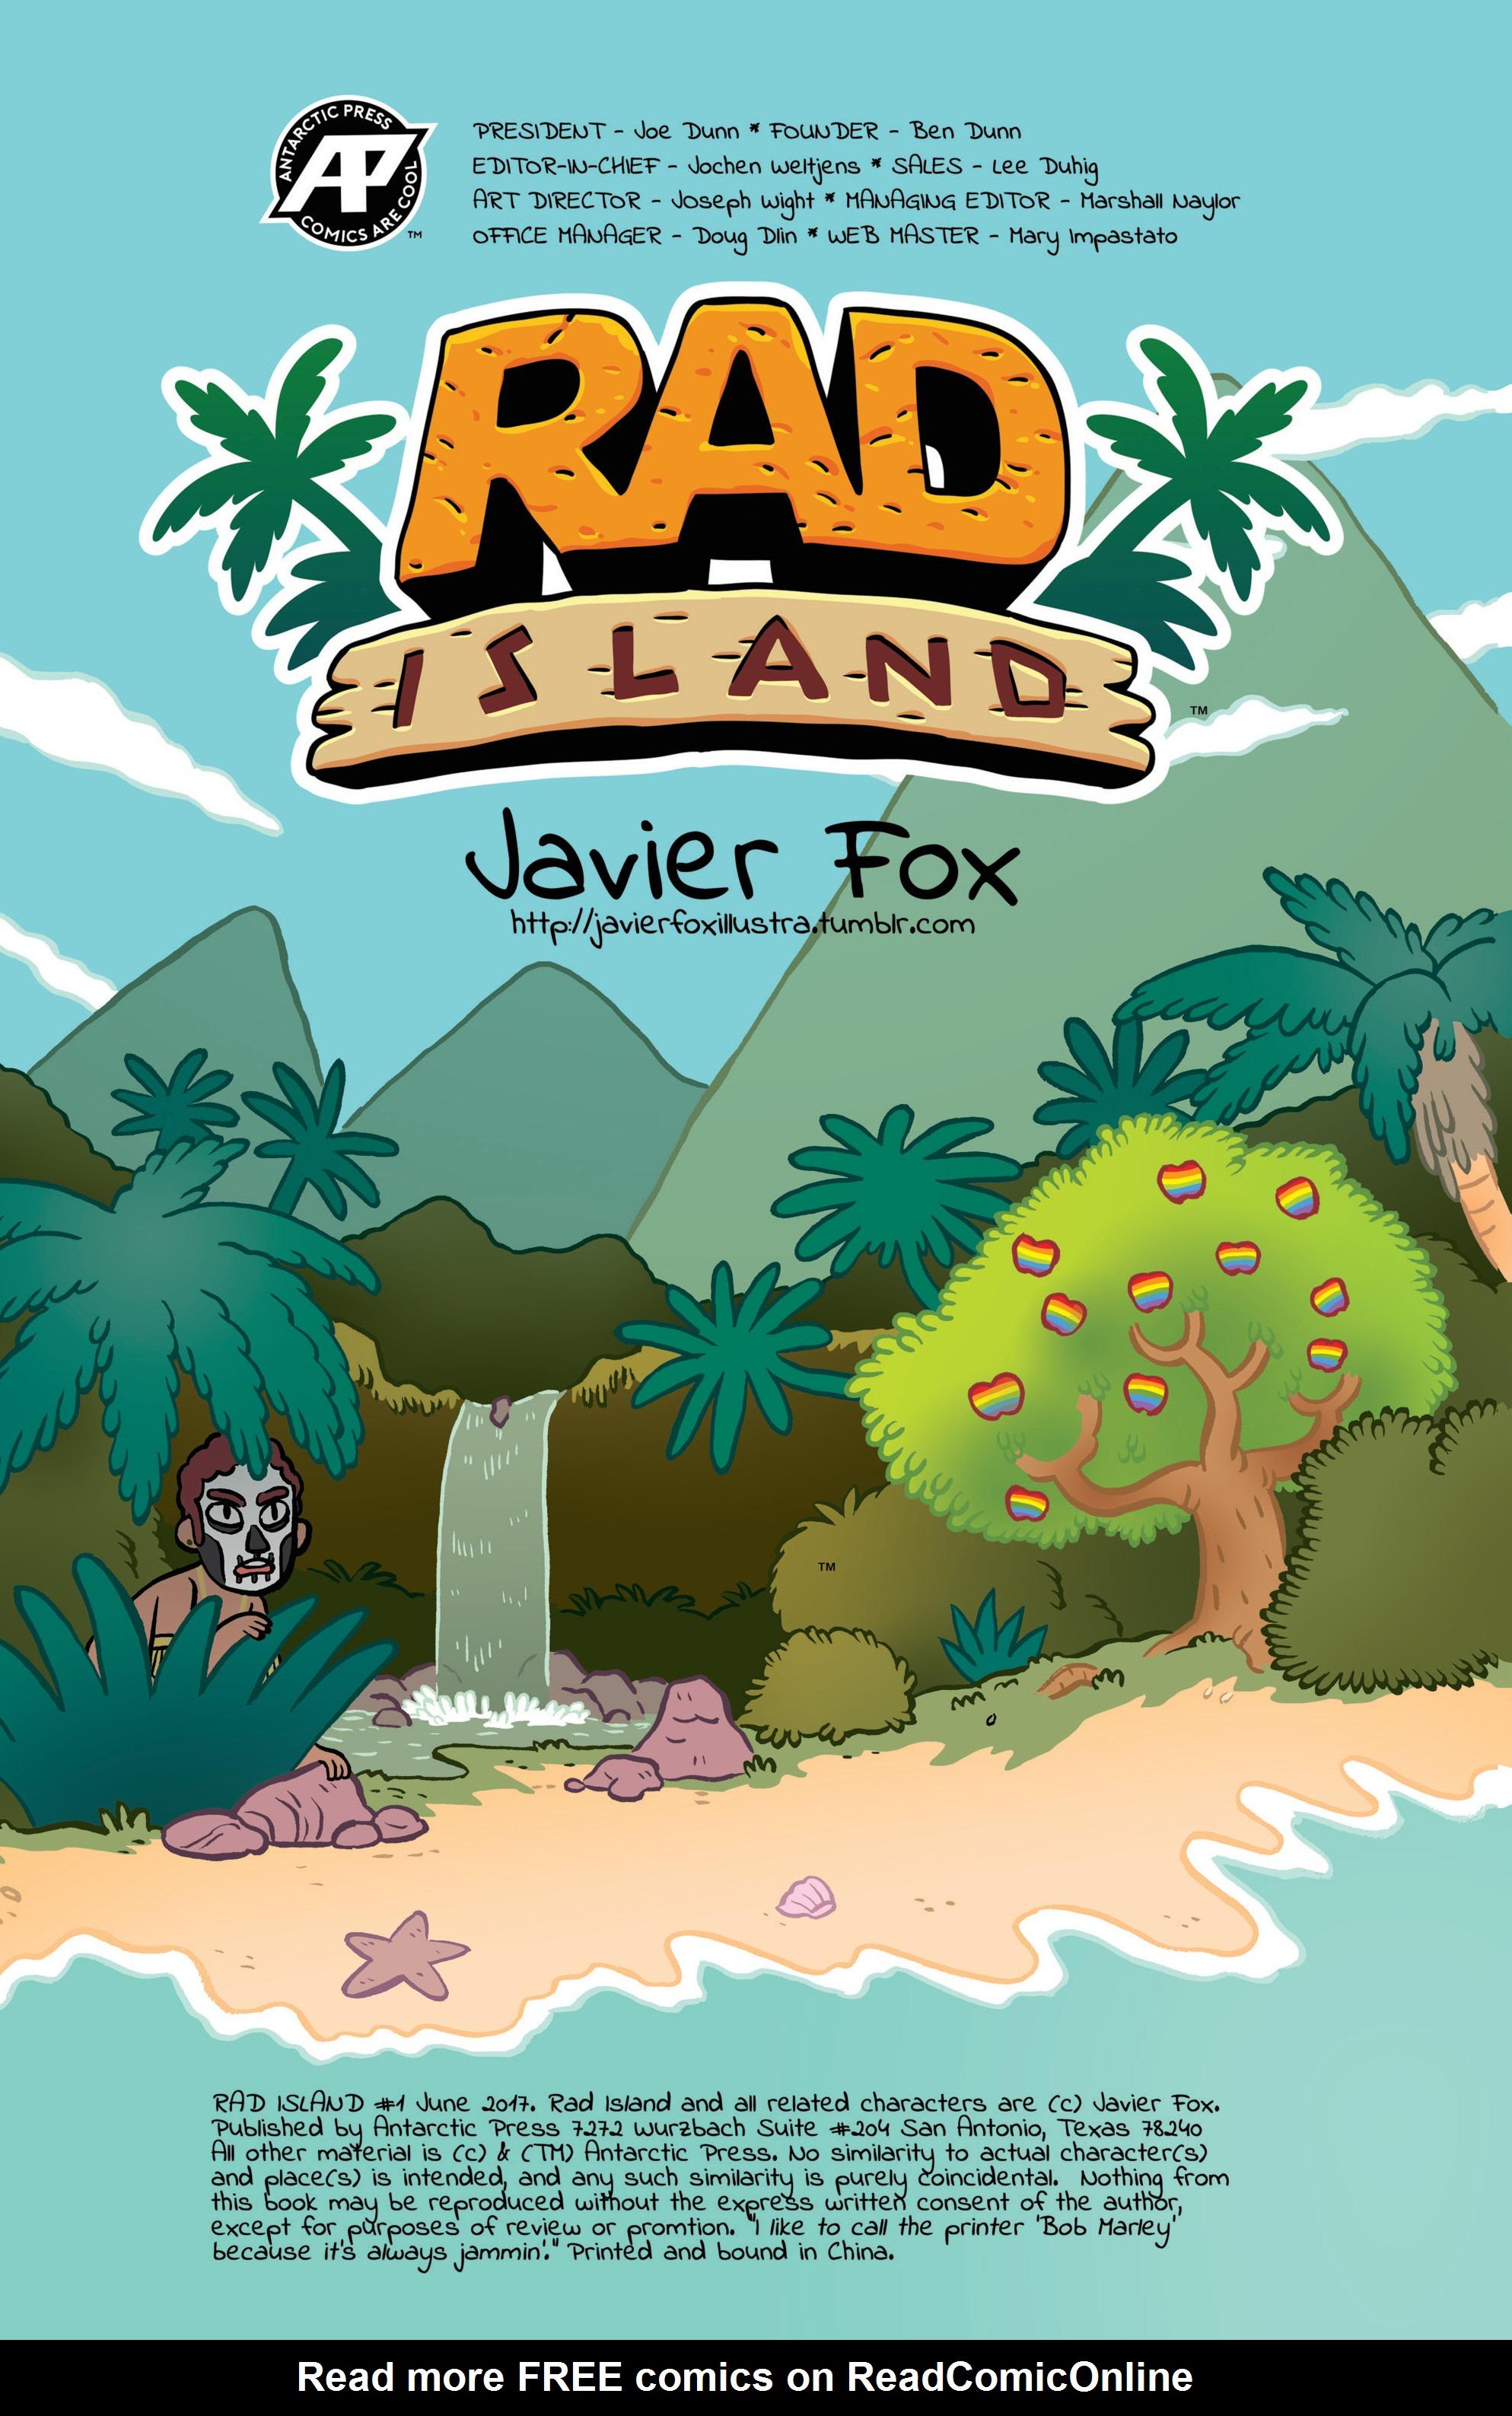 Read online Rad Island comic -  Issue # Full - 2